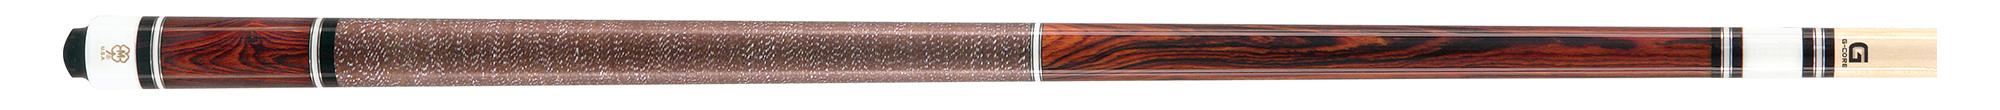 PK3014: McDermott G223 Cocobolo pool Gewicht: 19Oz #1